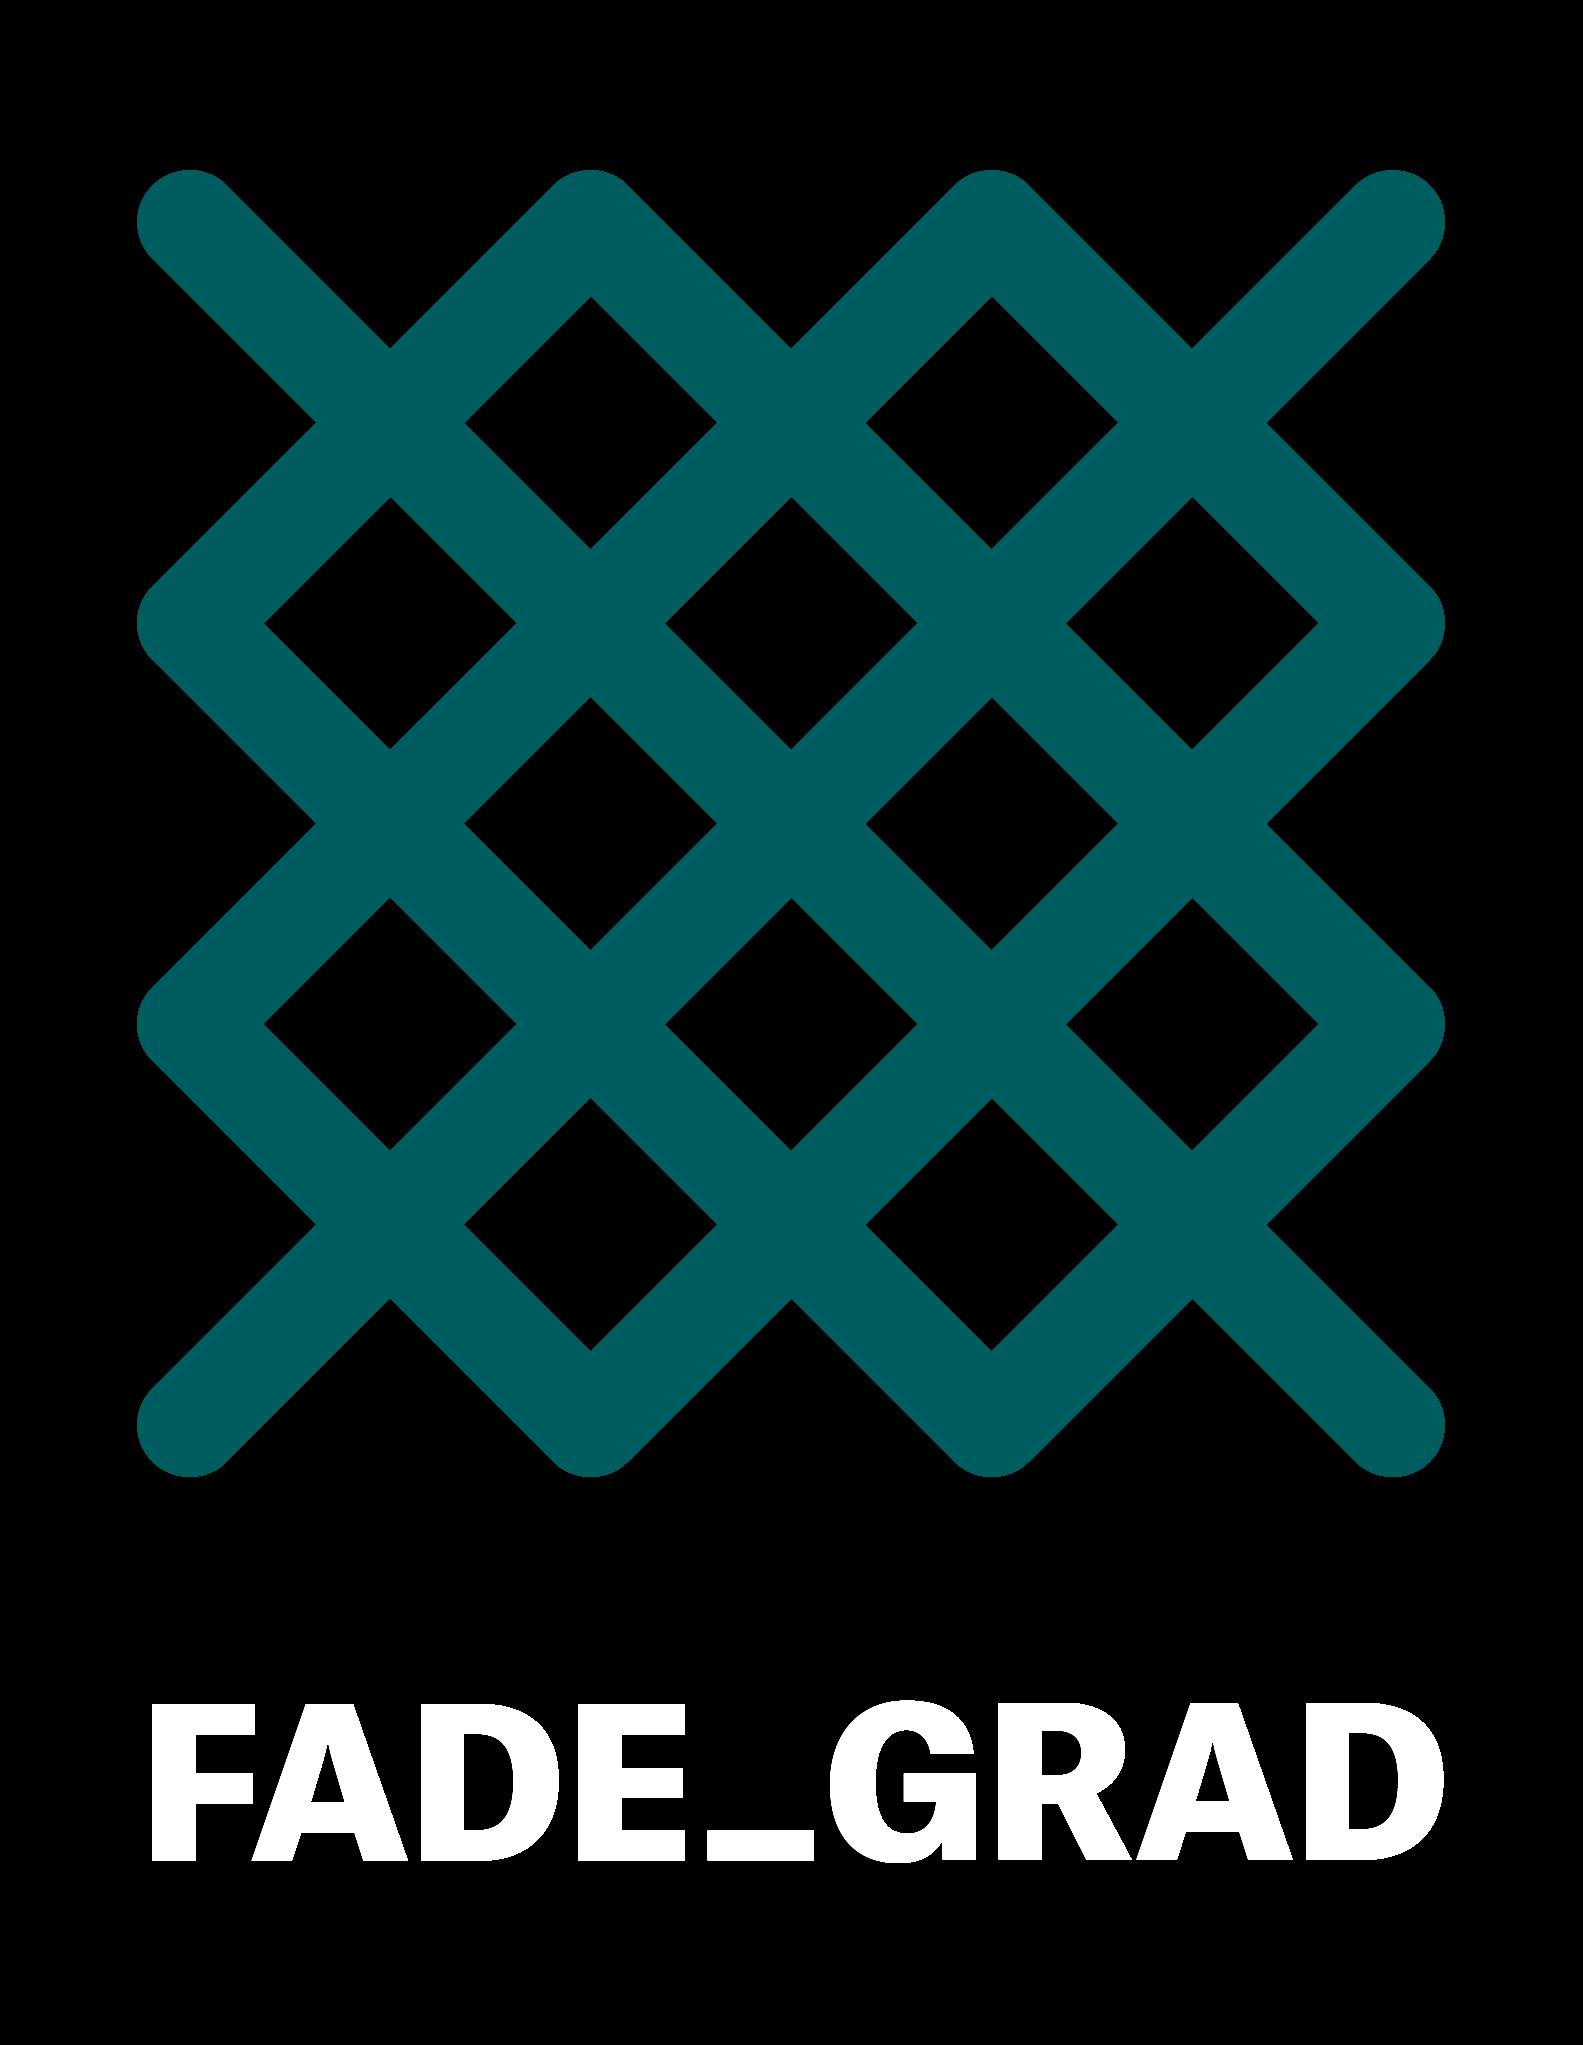 fadegrad Podcast